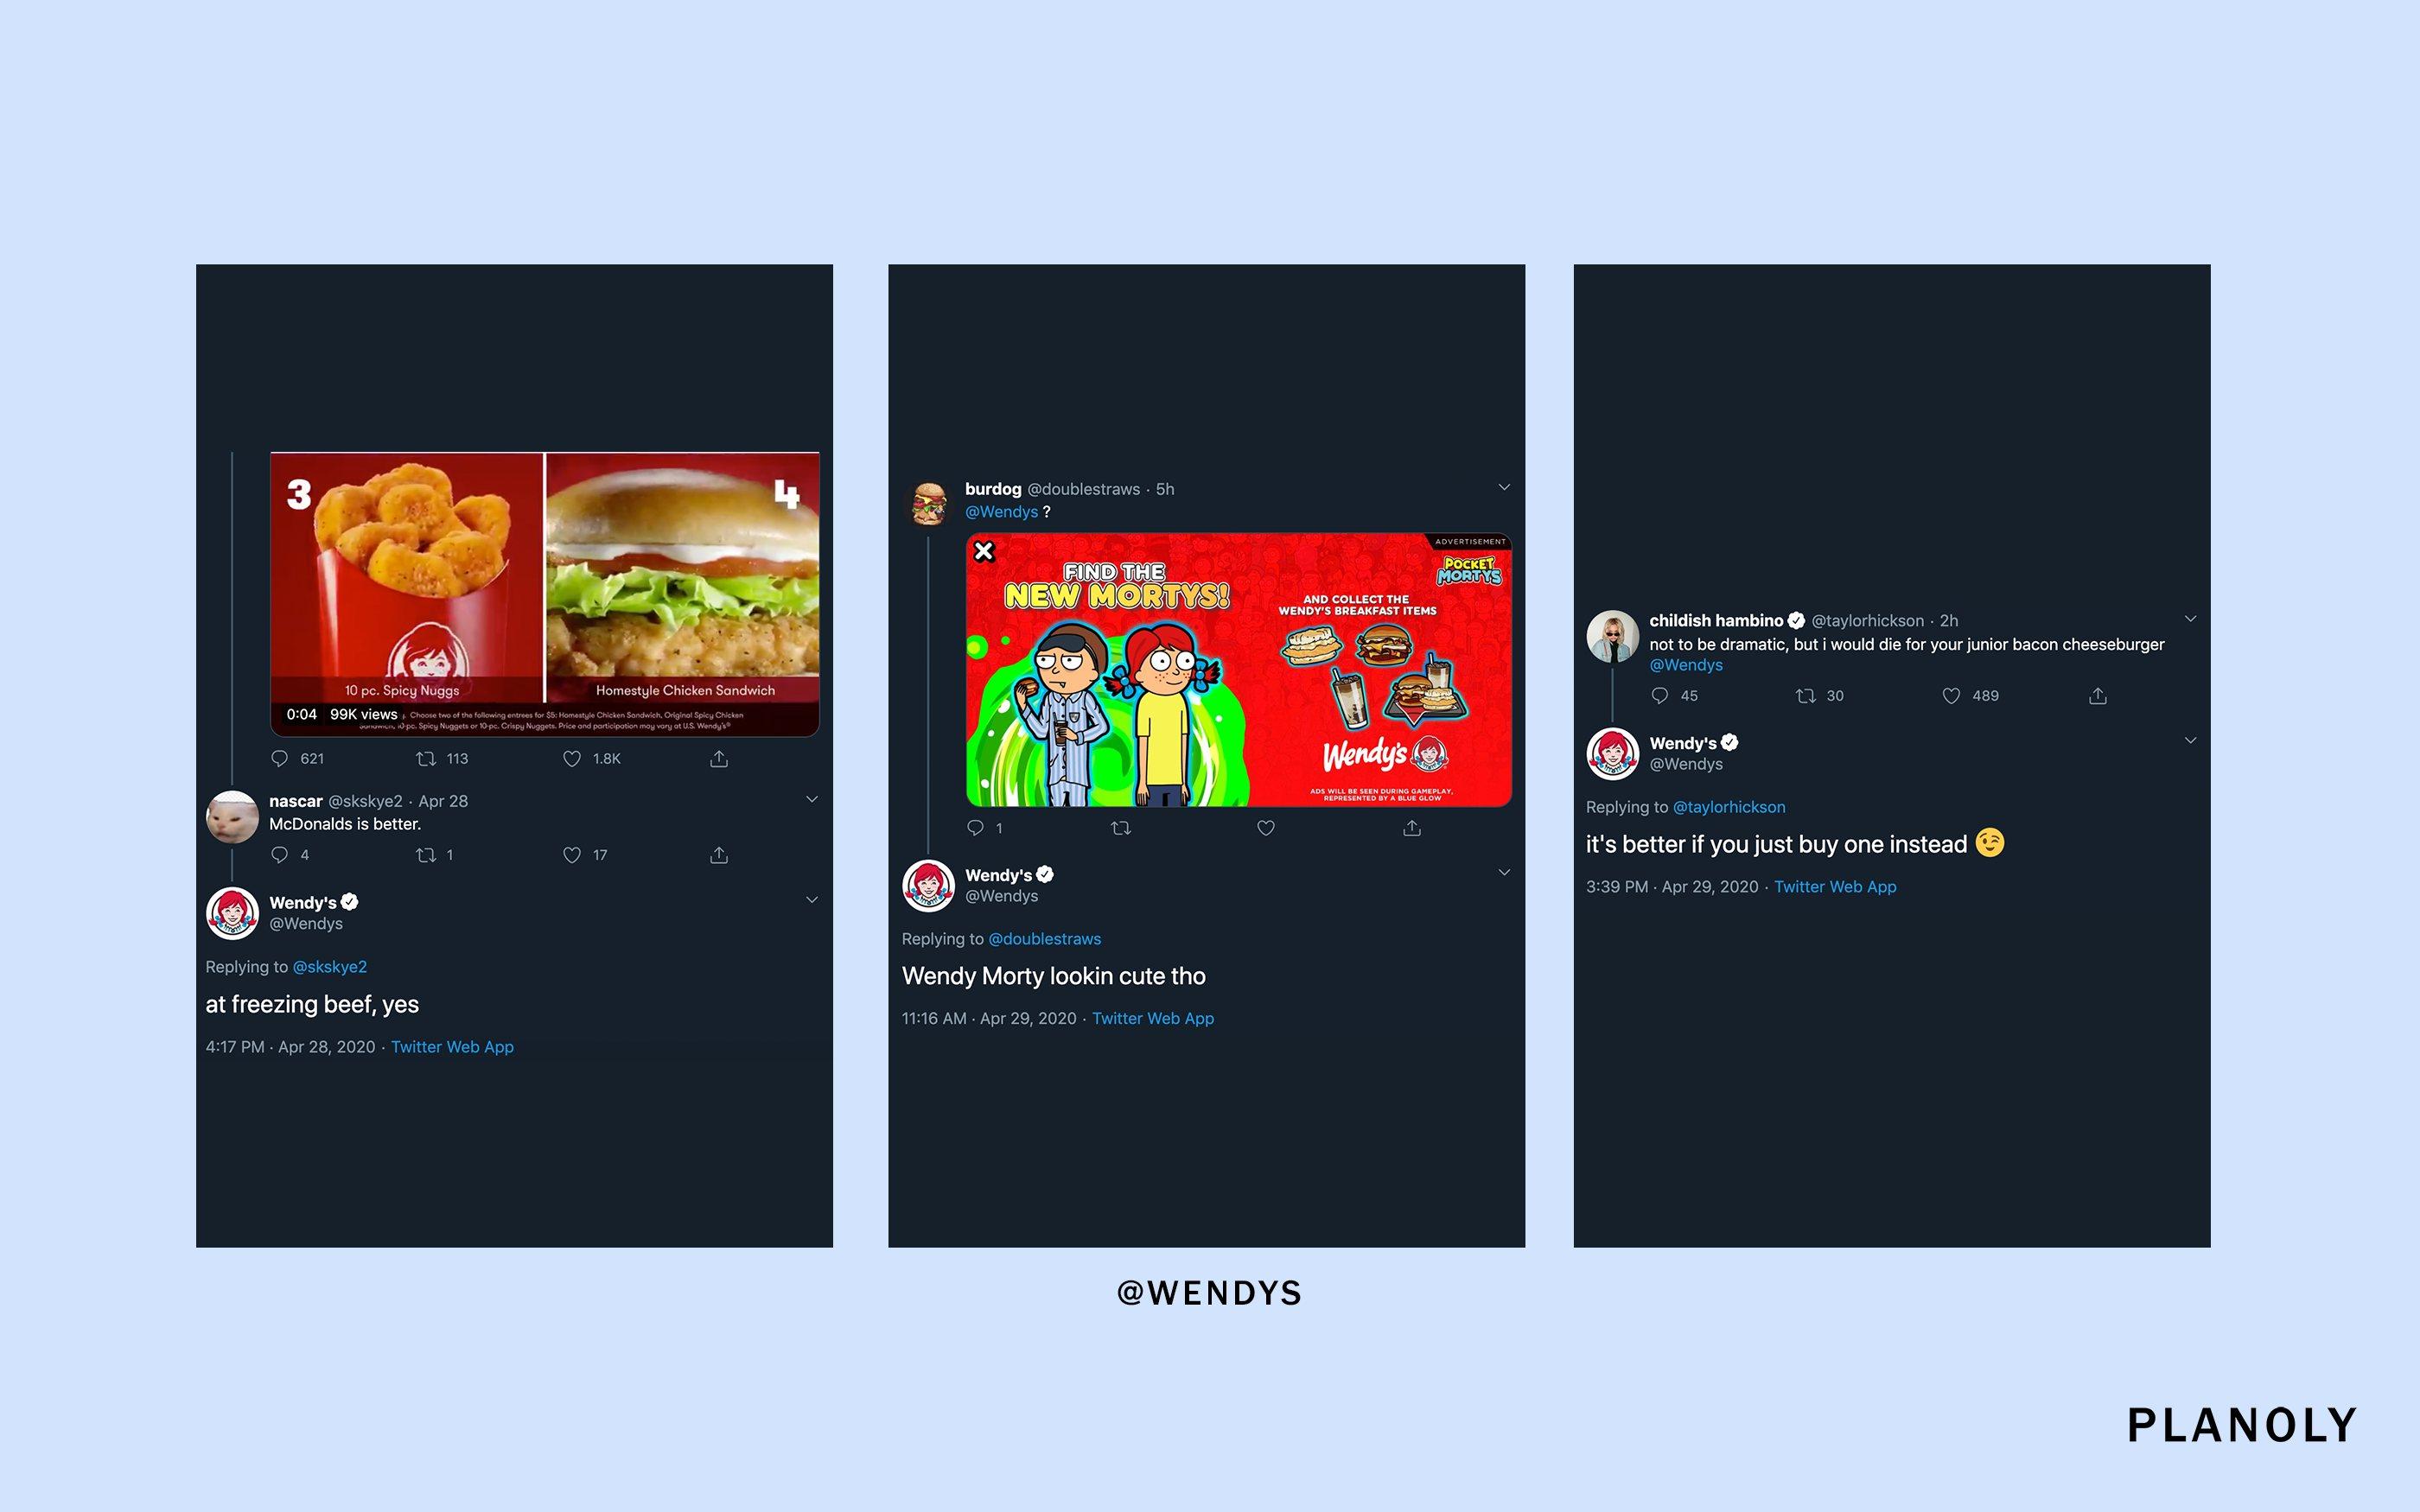 PLANOLY-Blog-Post-Twitter-Marketing-Strategies-Image-3